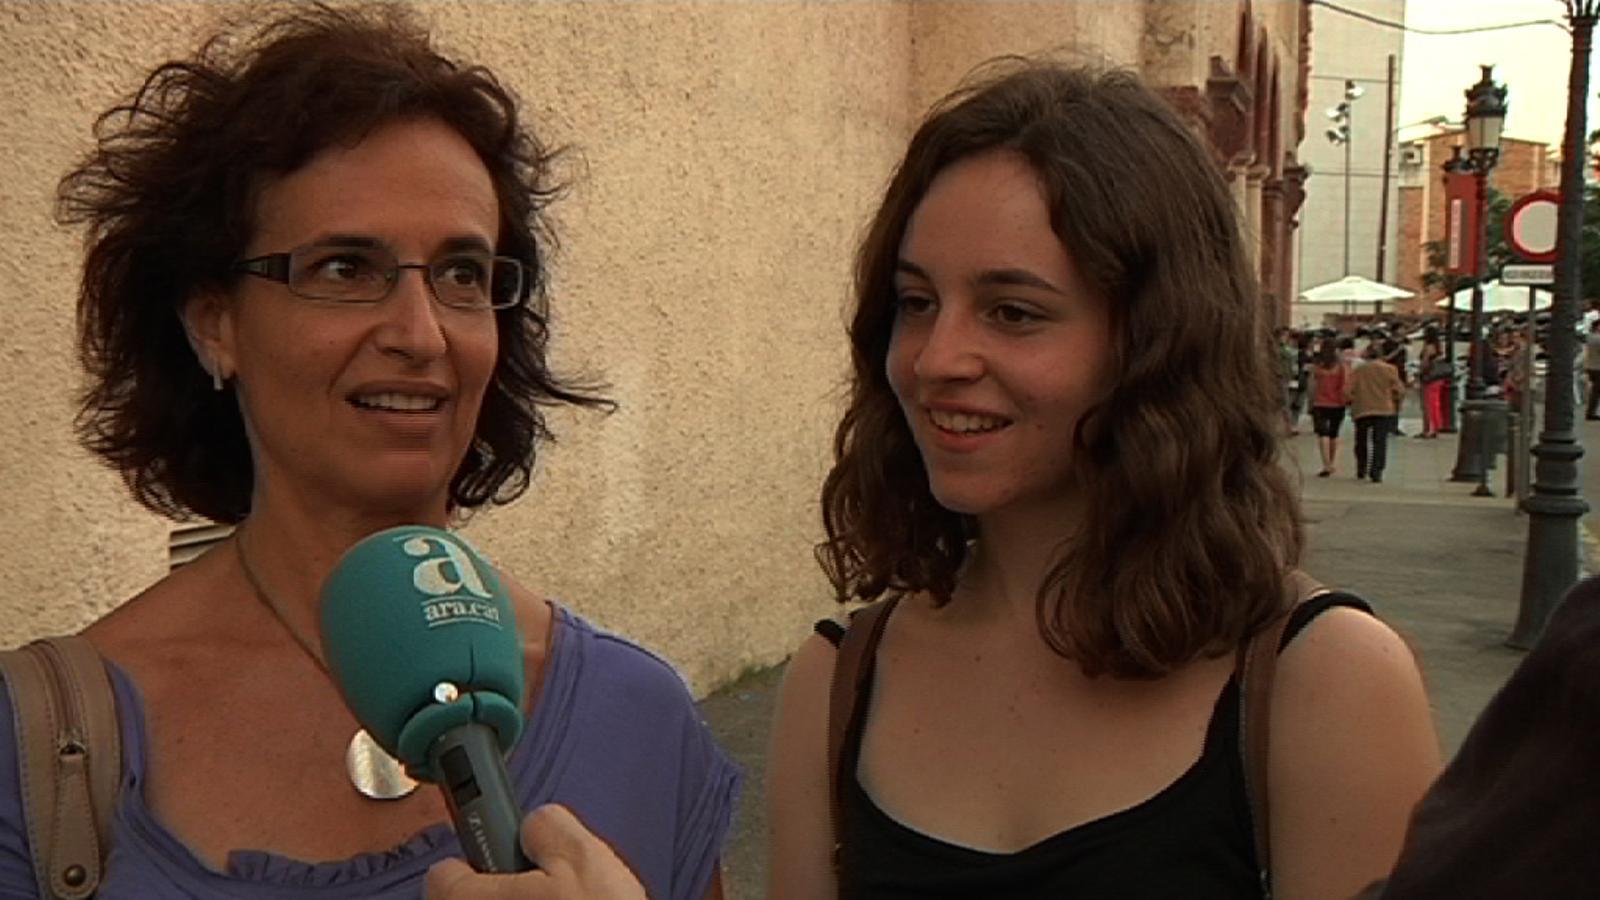 Elisenda Codina, espectadora del Grec: La mare proposa i jo dic: 'Vale'!